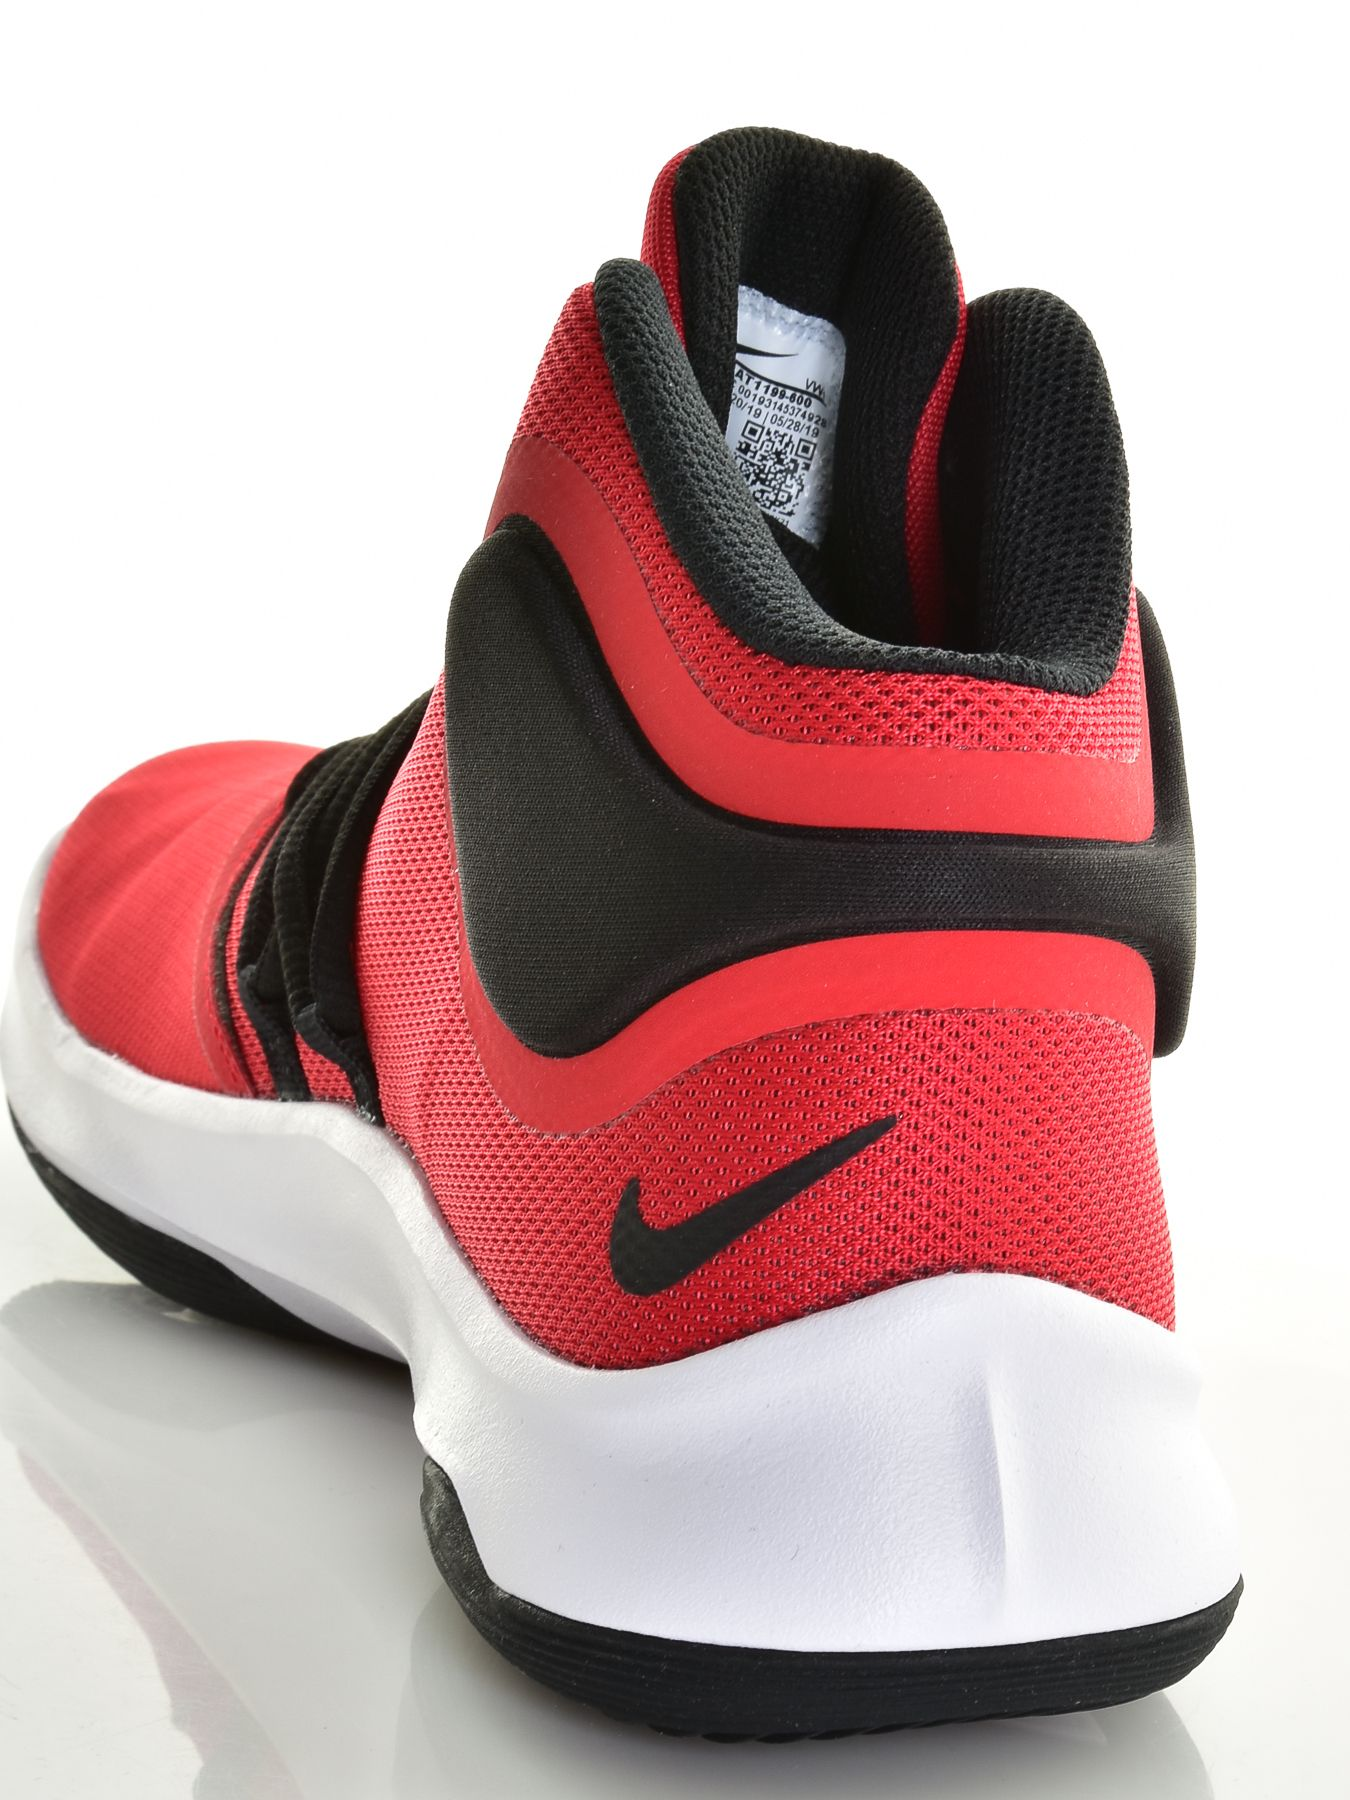 Nike férfi magasszárú cipő AIR VERSITILE IV | Markasbolt.hu